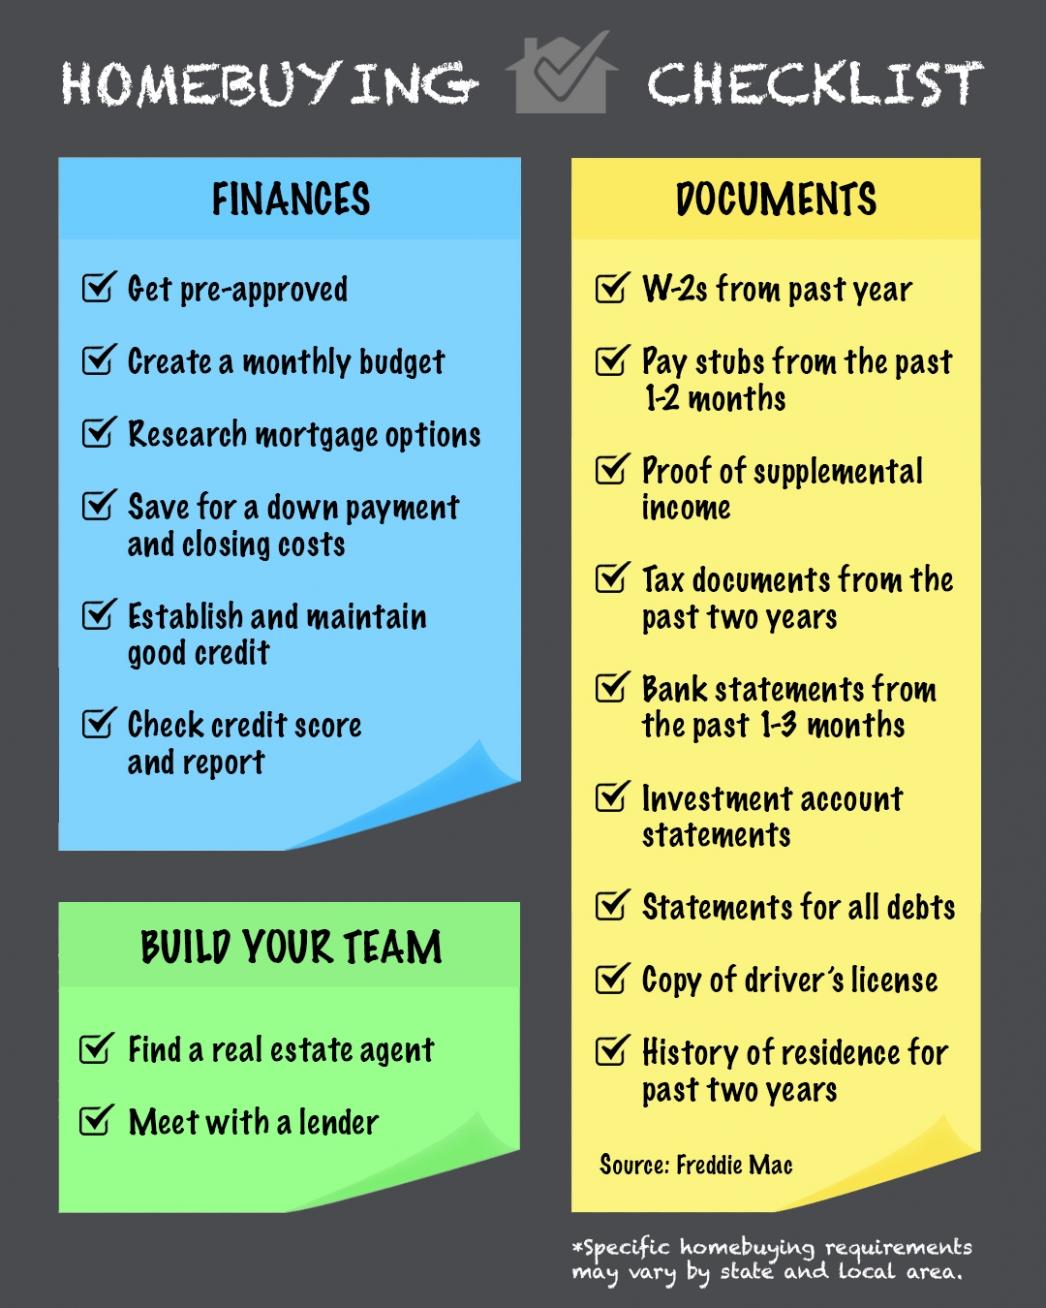 2020 Homebuying Checklist | MyKCM